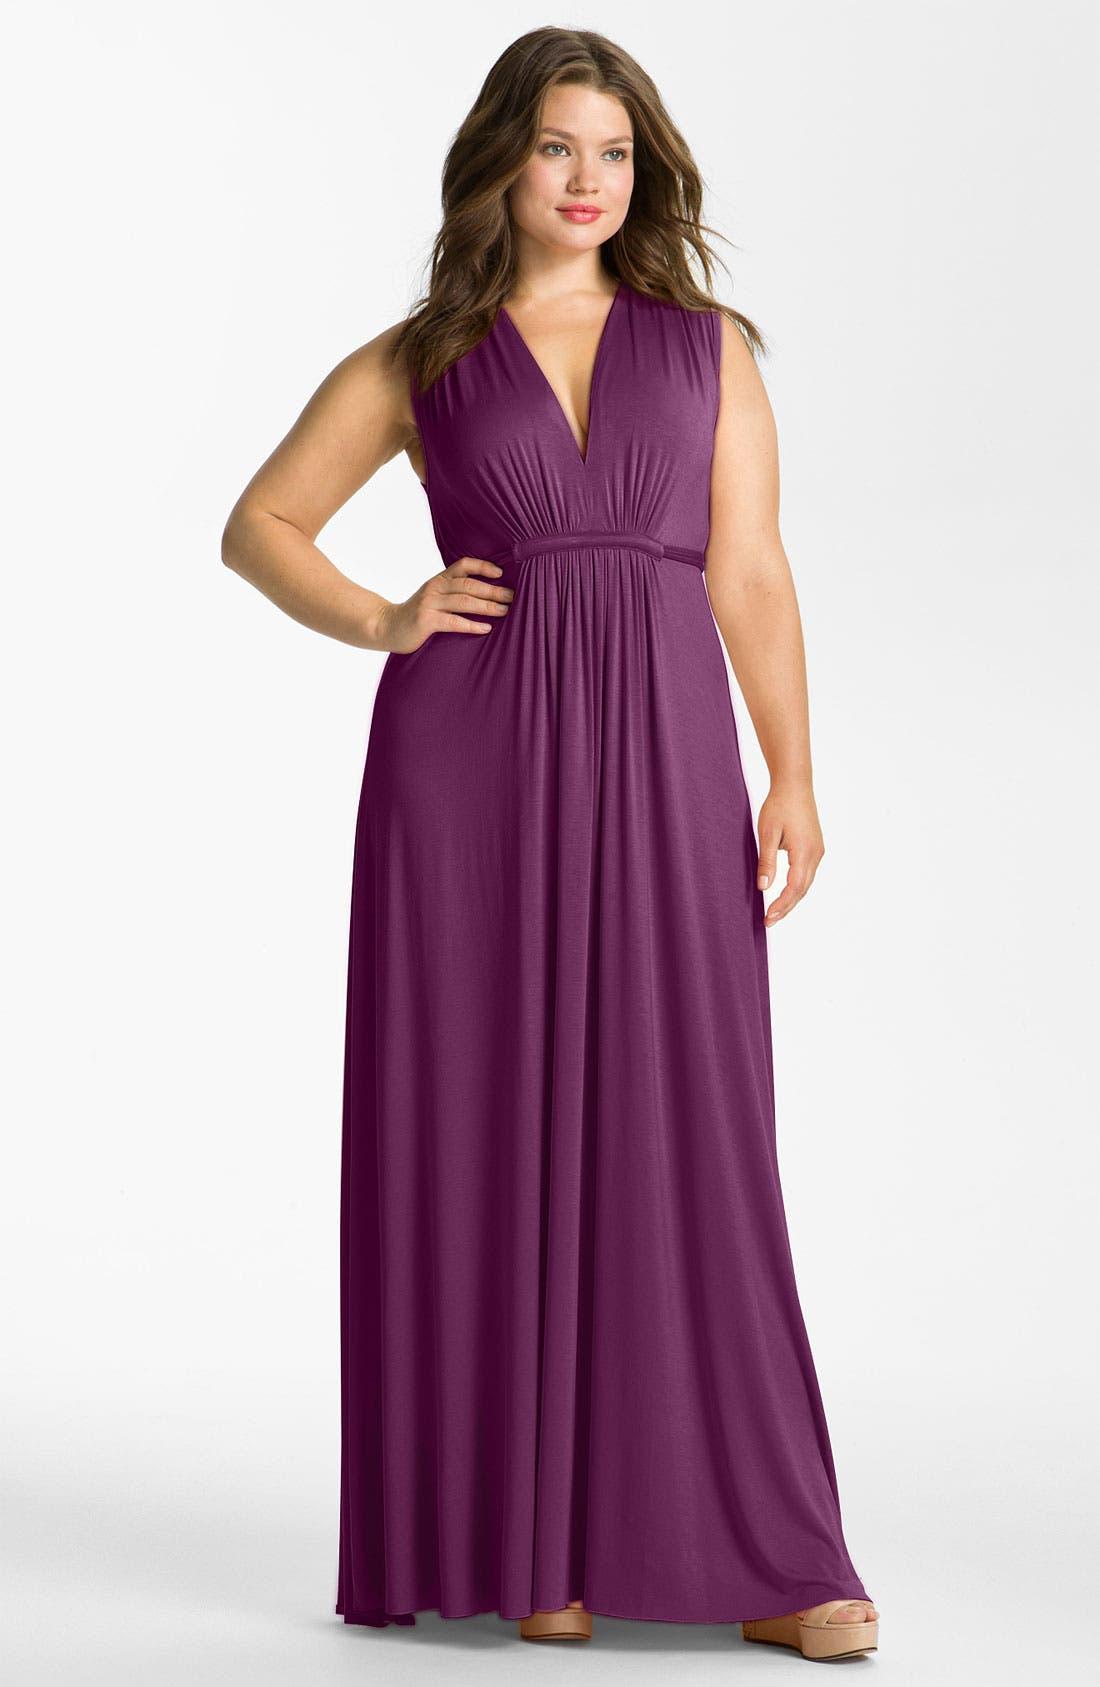 Alternate Image 1 Selected - Rachel Pally Sleeveless Caftan Dress (Plus)